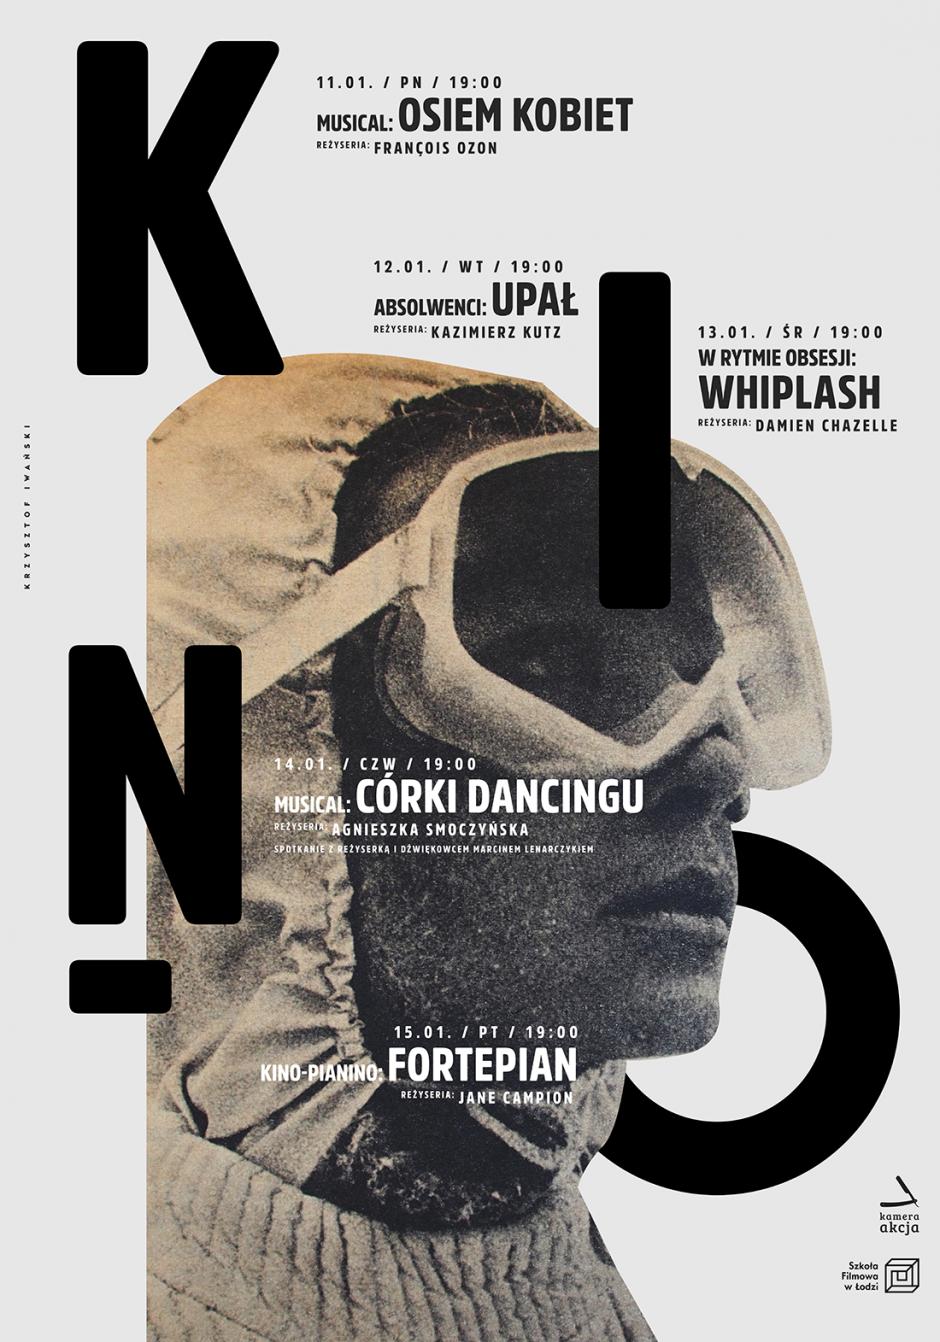 Film School Cinema posters